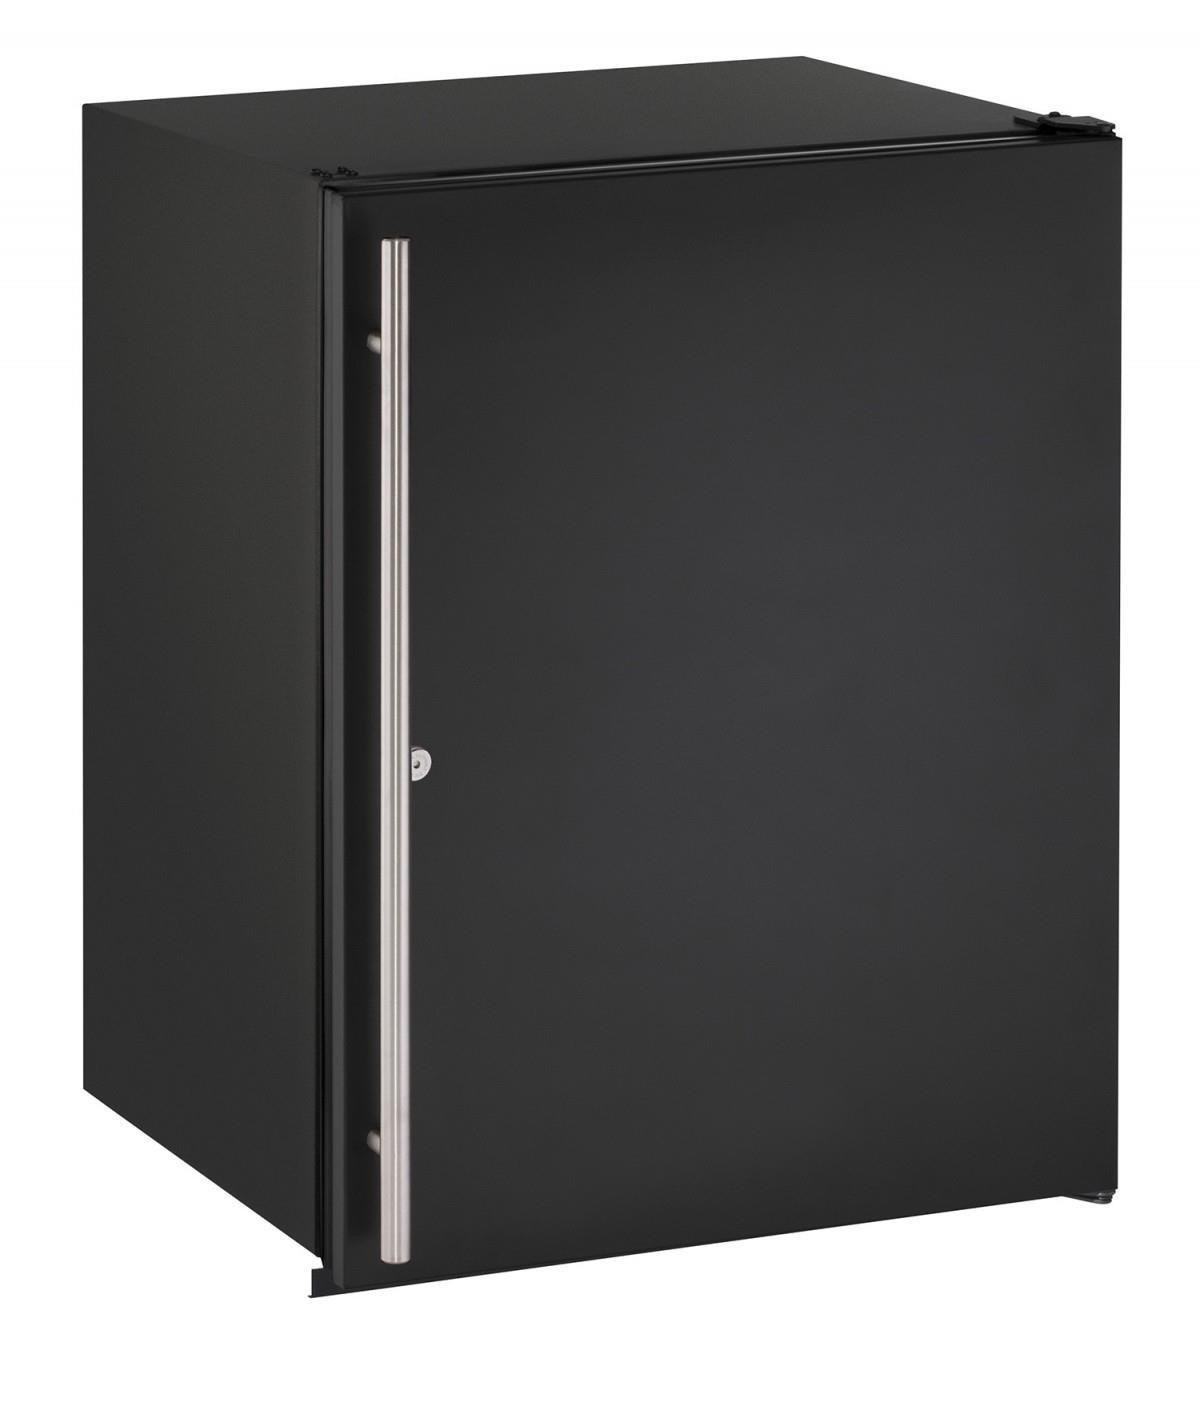 U-Line Refrigerators 5.3 cu. ft. Under-Counter Refrigerator - Item Number: U-ADA24RB-13A